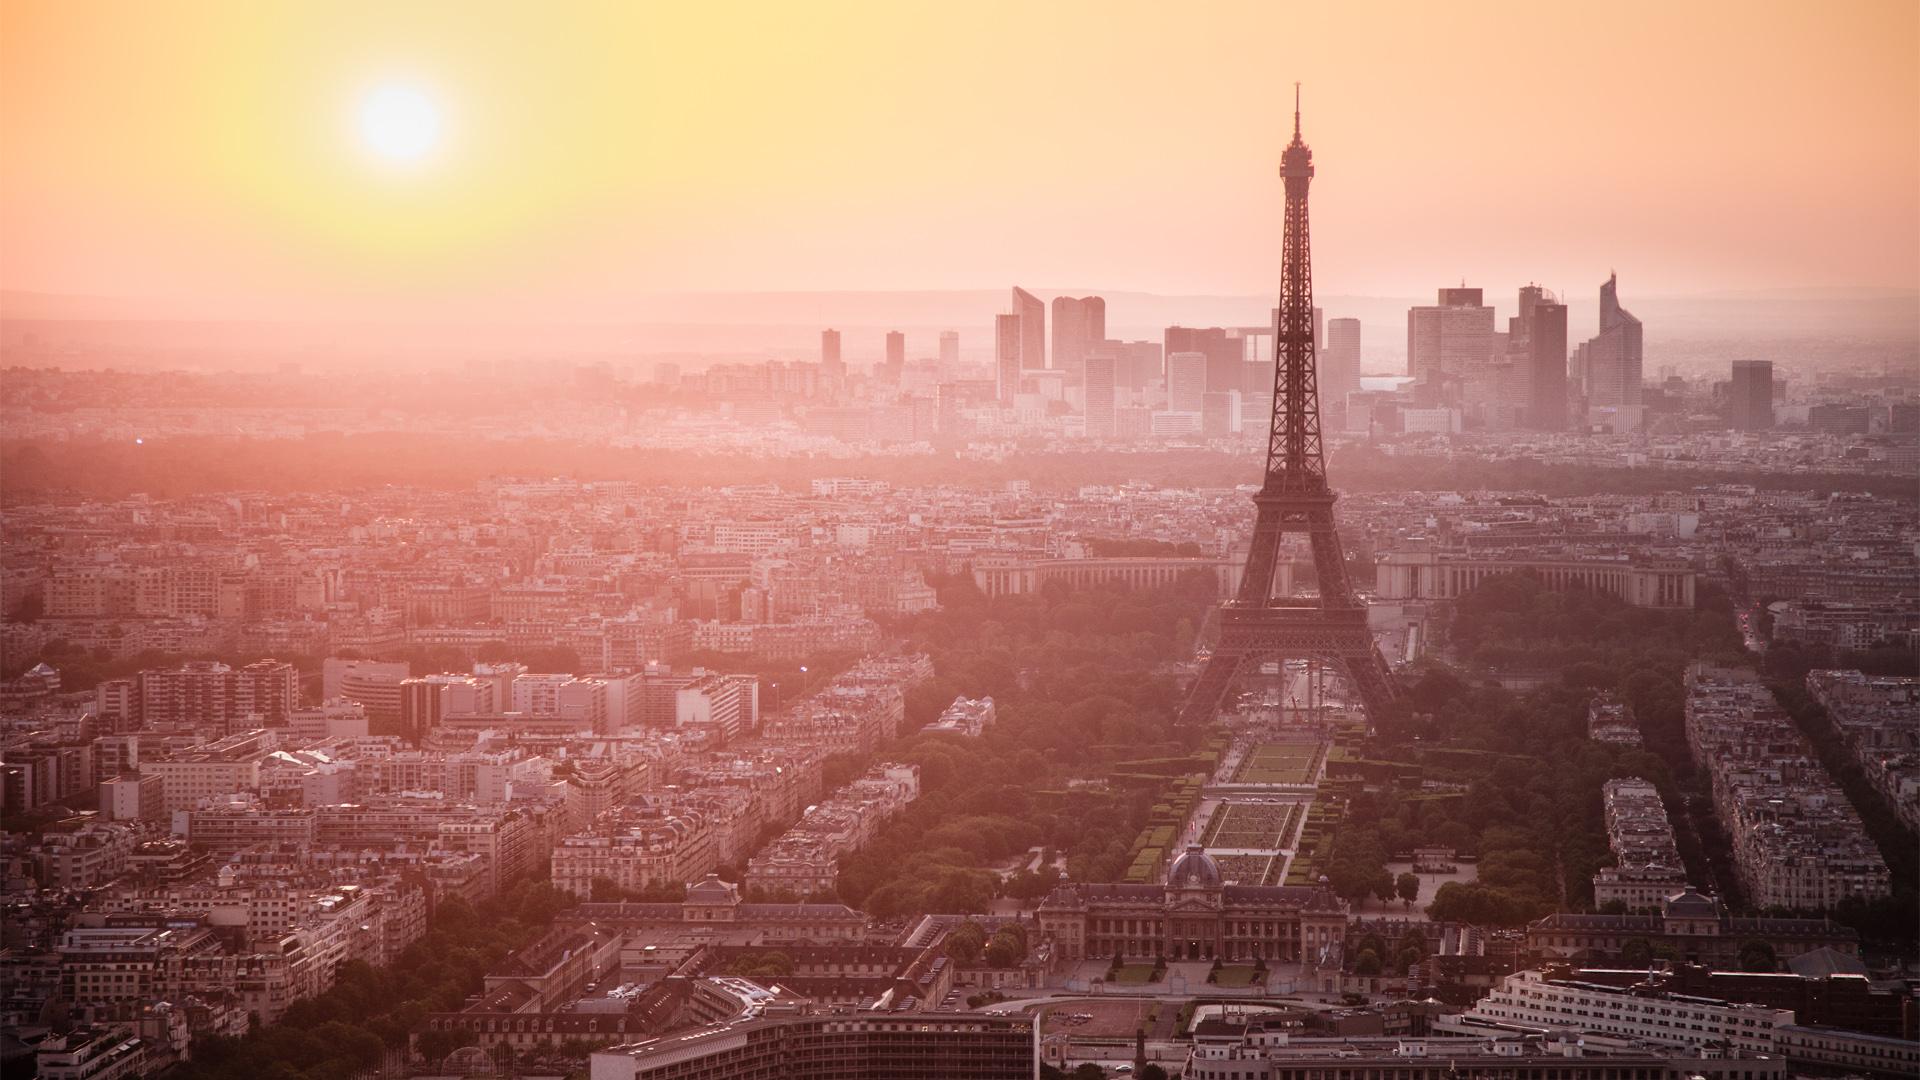 Theme Bin Blog Archive Paris Sunset Skyline HD Wallpaper 1920x1080